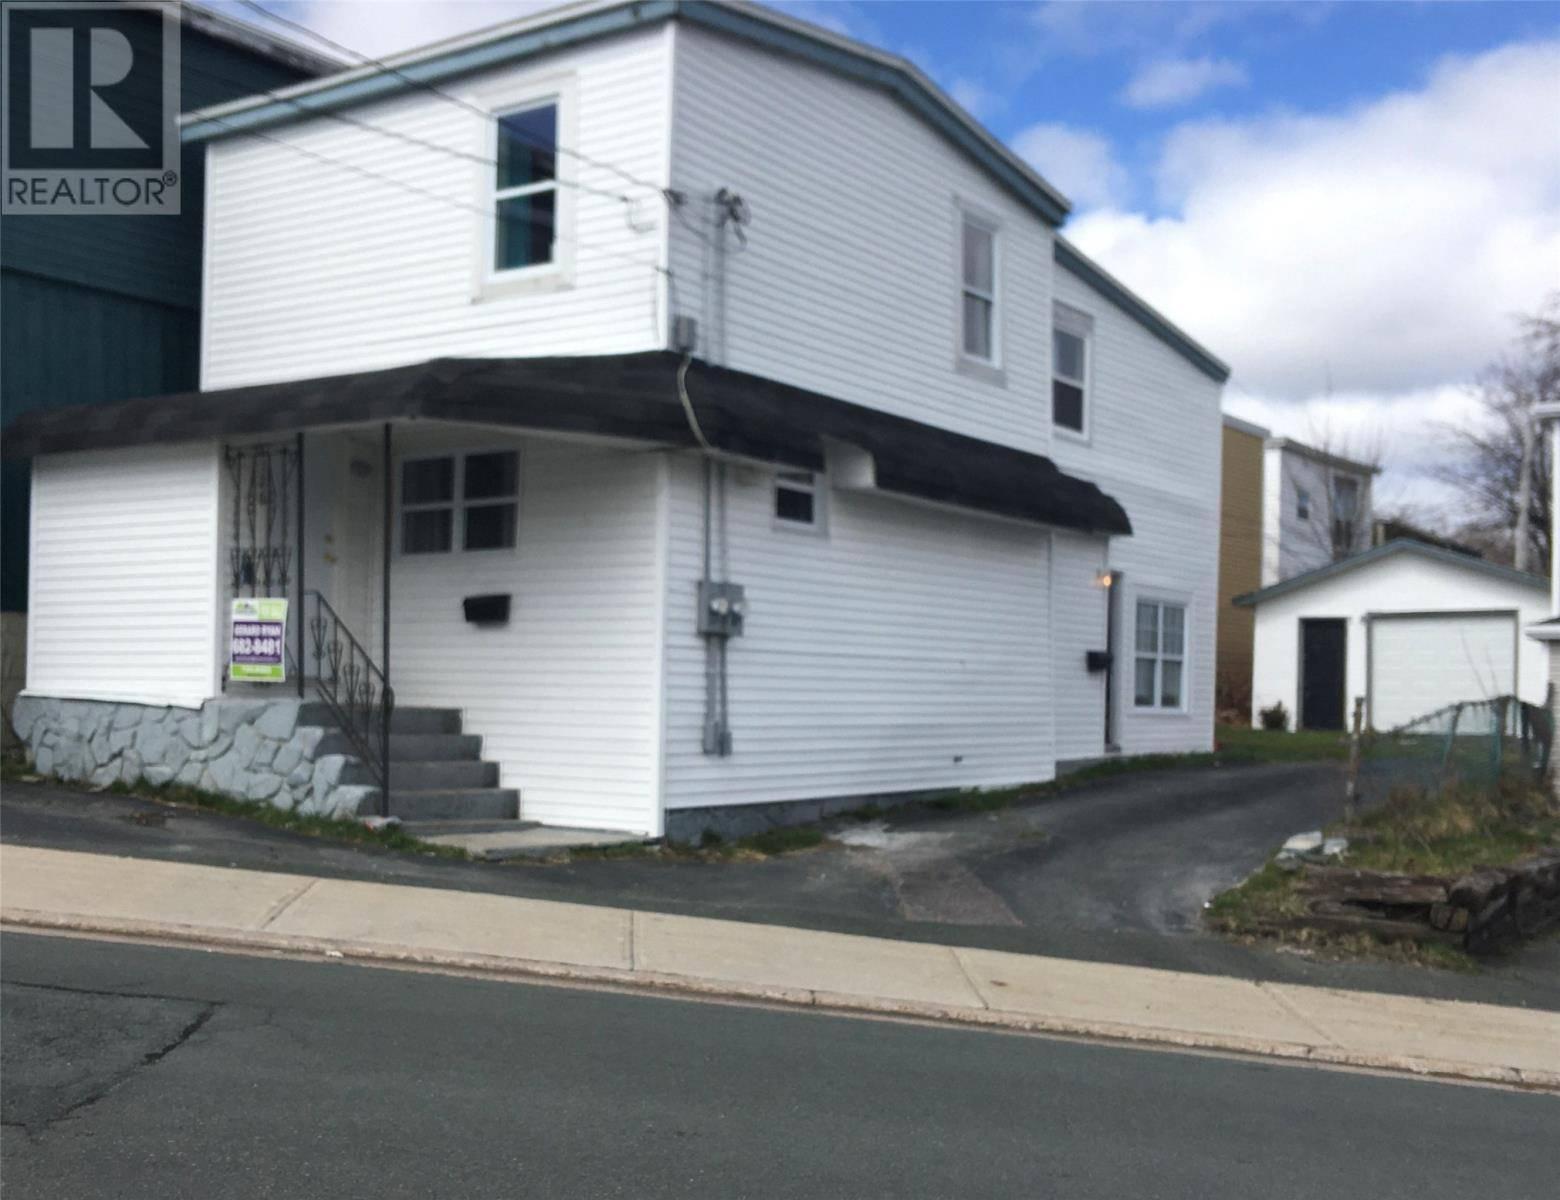 House for sale at 126 Casey St St. John's Newfoundland - MLS: 1207777